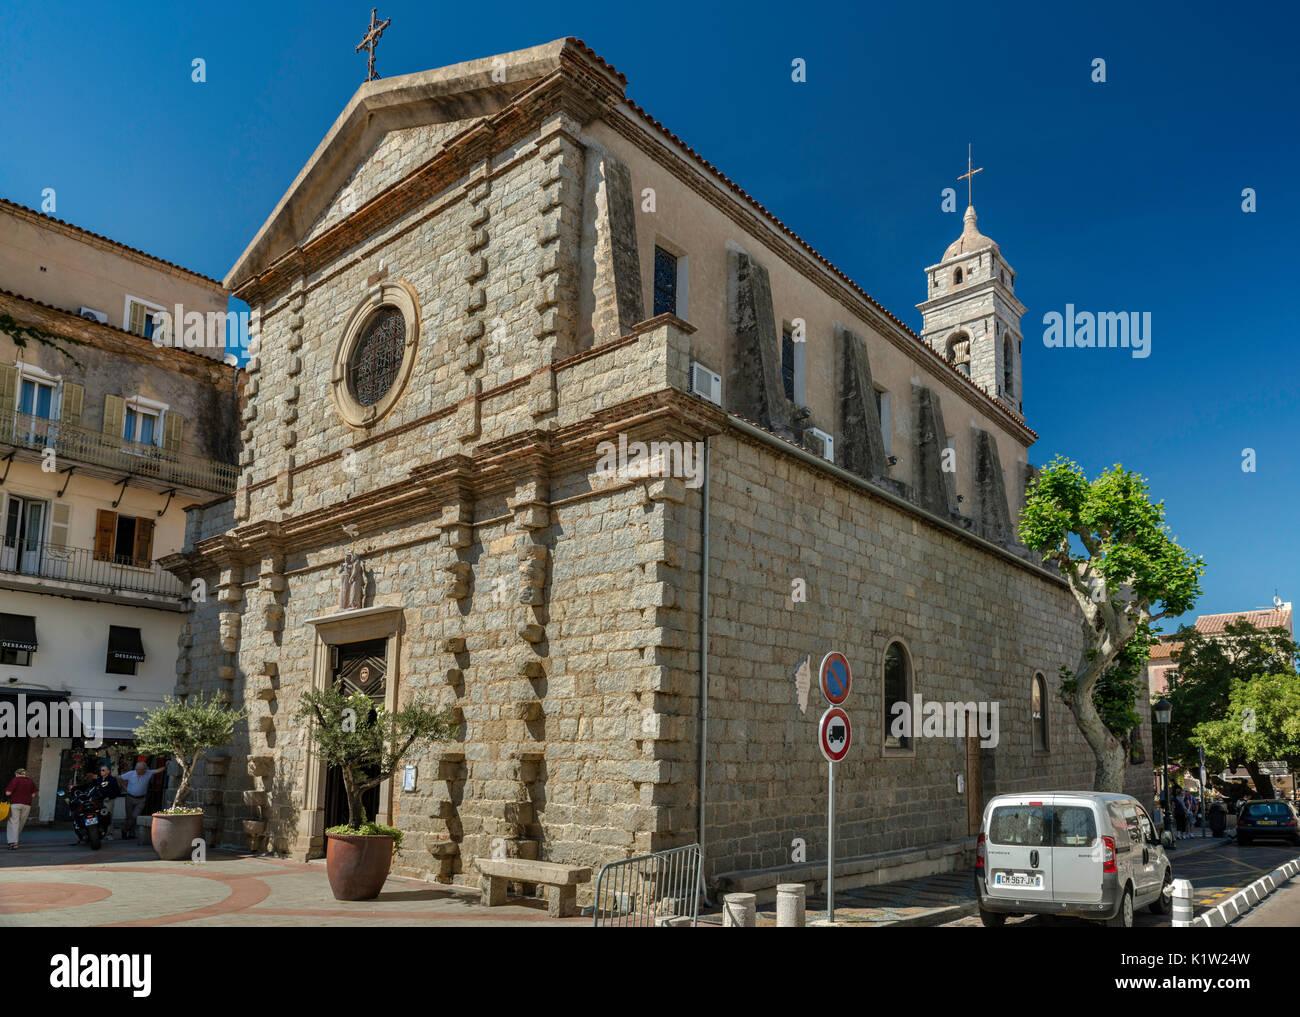 St-Jean-Baptiste Church, del siglo XVI, en la Place de la Republique, en Porto-Vecchio, Córcega, Francia Imagen De Stock